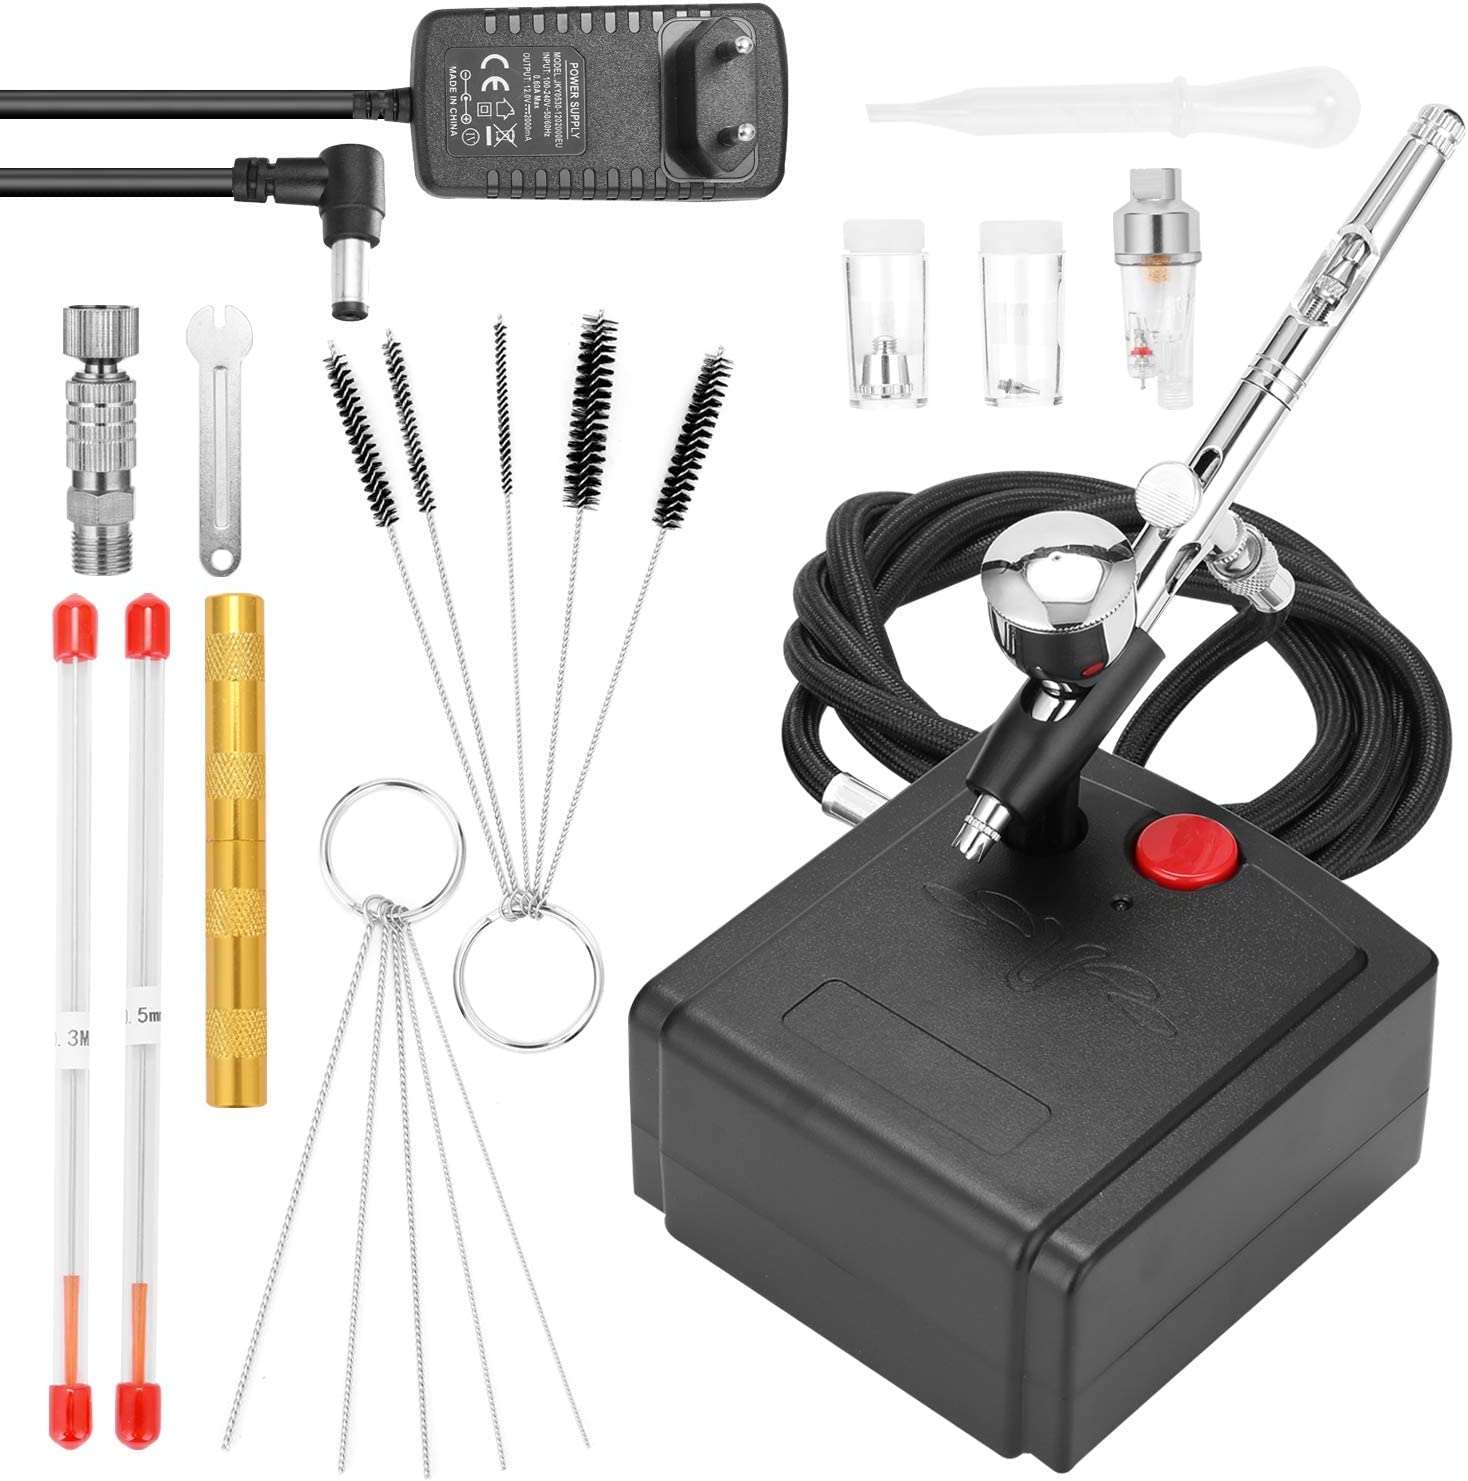 Festnight Juego de aerógrafo profesional para modelismo, pintura artística con compresor de aire + adaptador de corriente + aerógrafo + soporte para aerógrafo + aguja de 0,3 mm + aguja de 0,5 mm